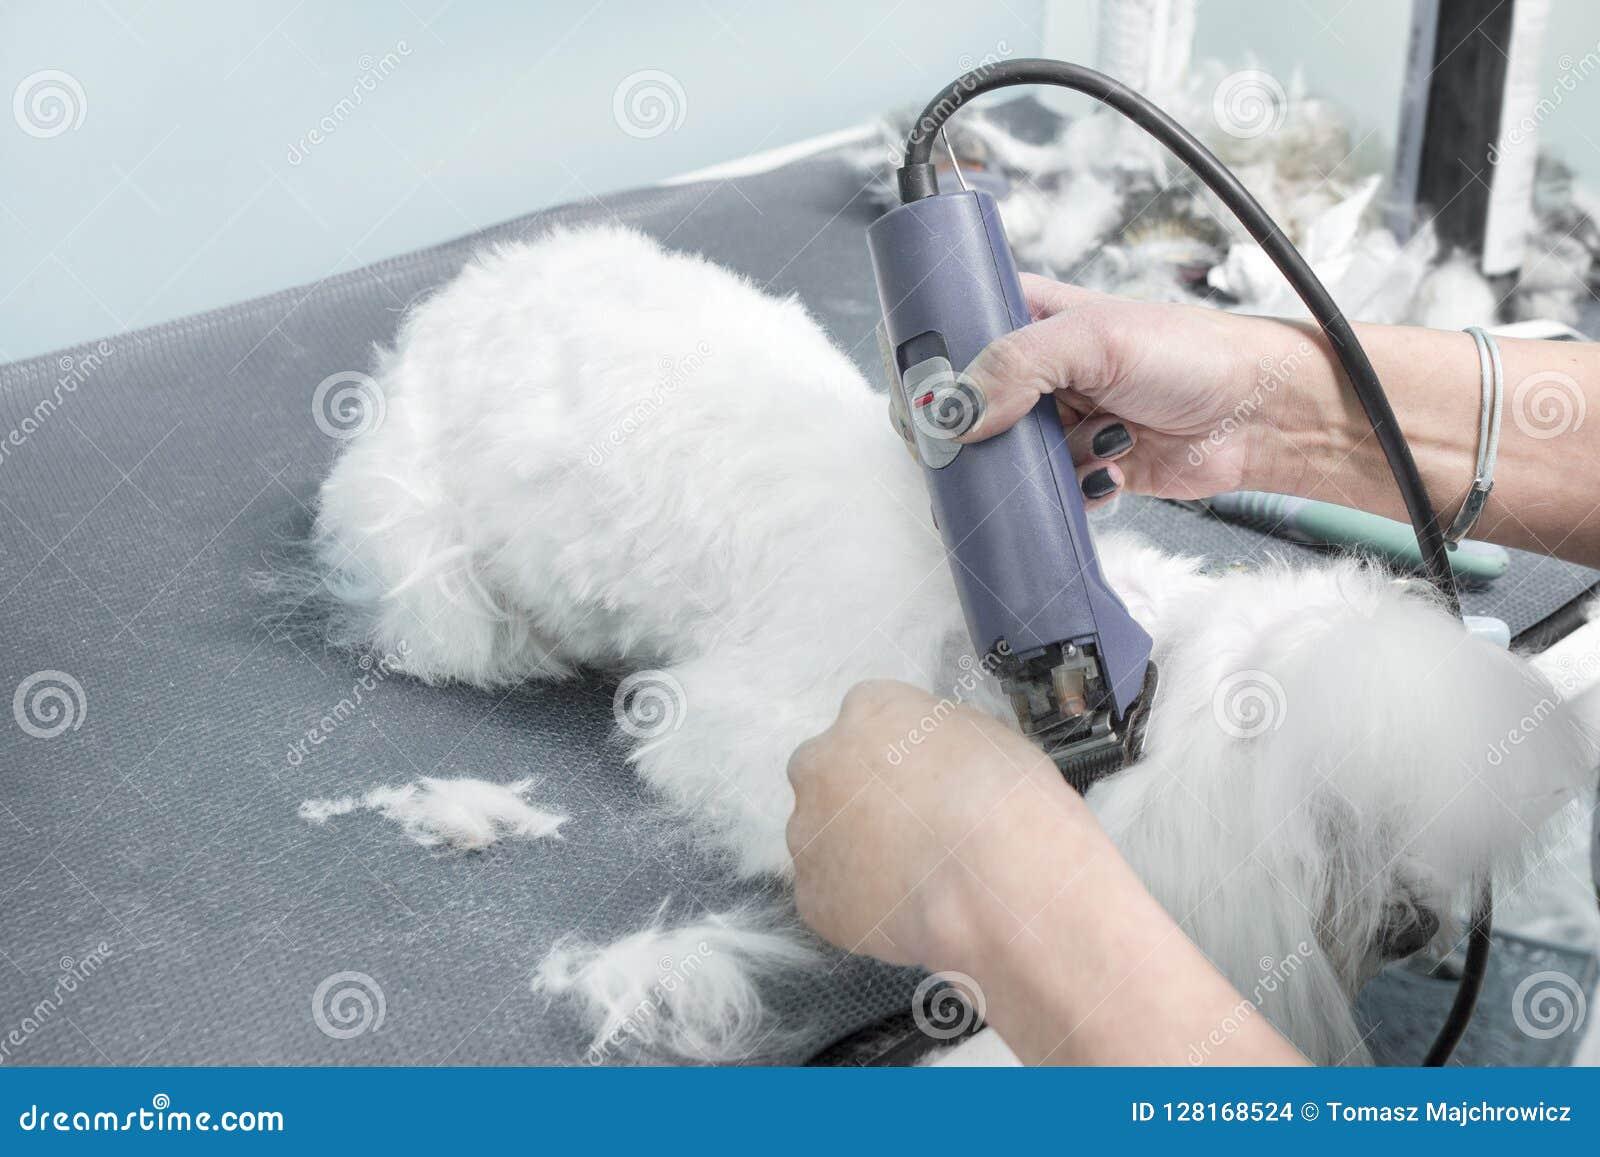 5 En kvinna klipper en maltesisk hund med en elektrisk clipper i en djur skönhetsalong